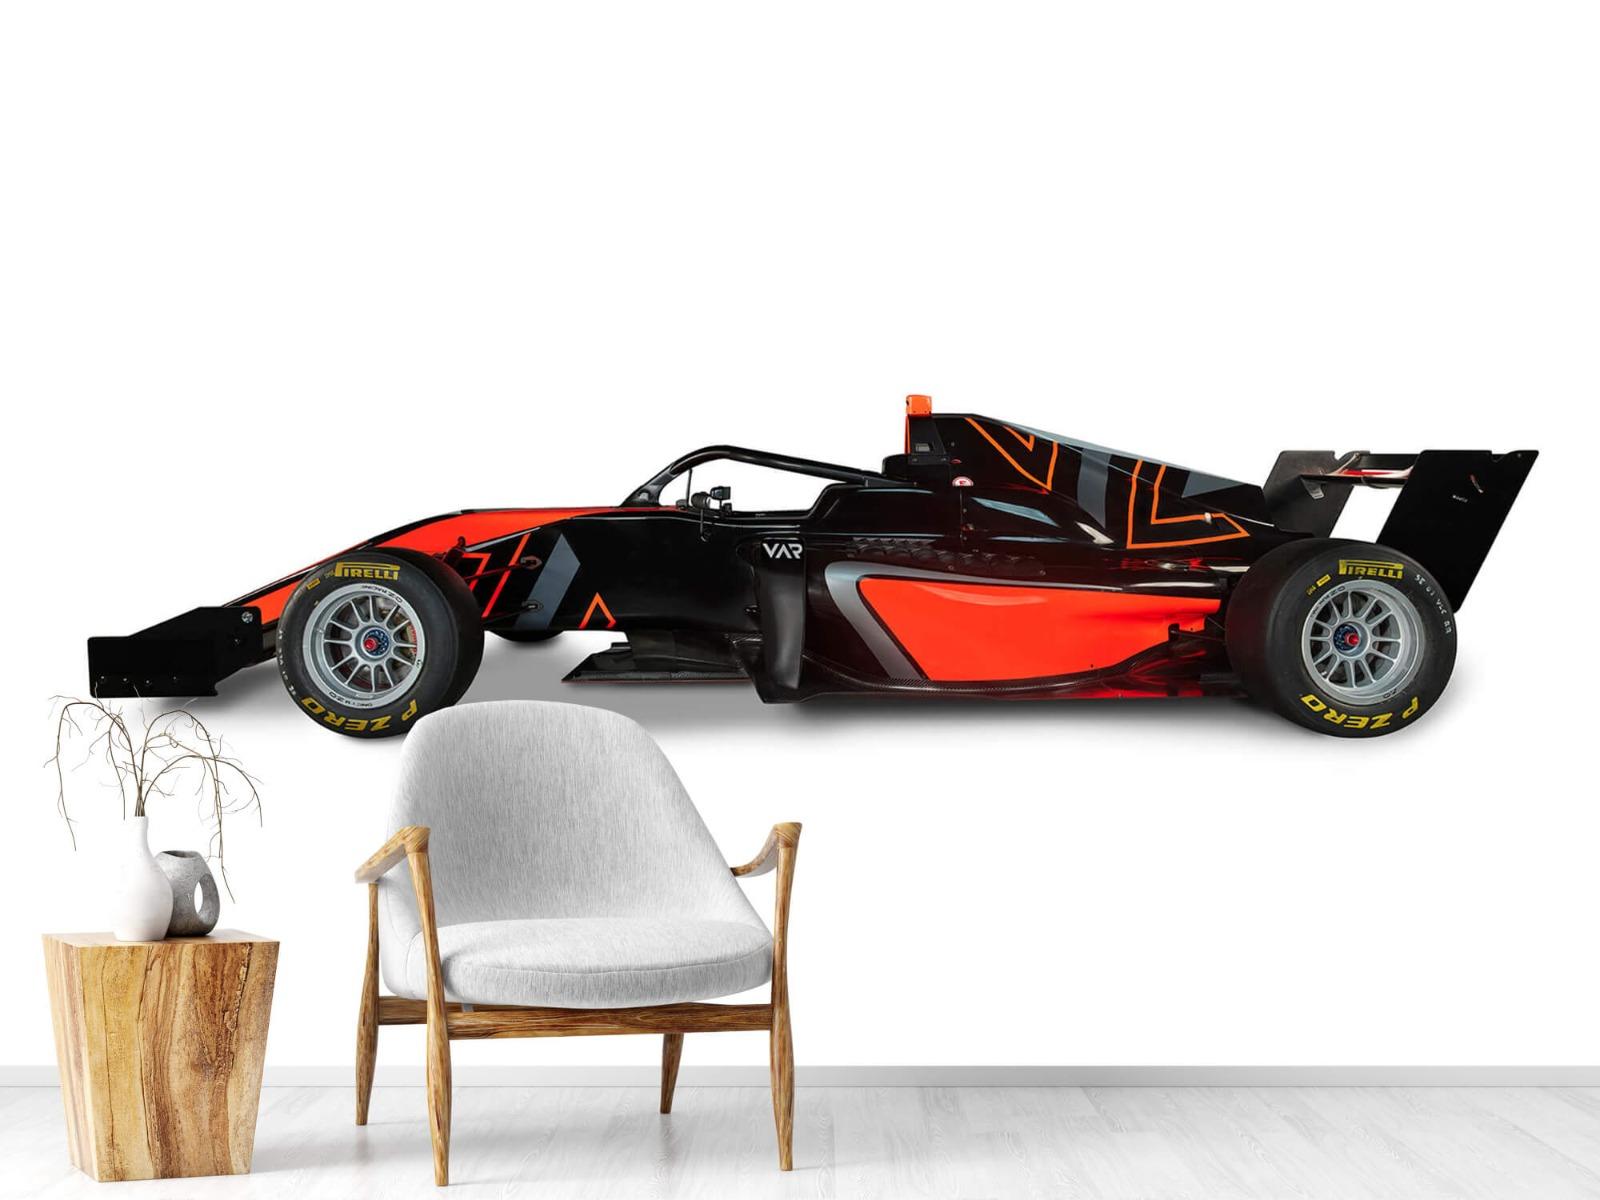 Sportauto's - Formule 3 - Lower side view - Computerruimte 18